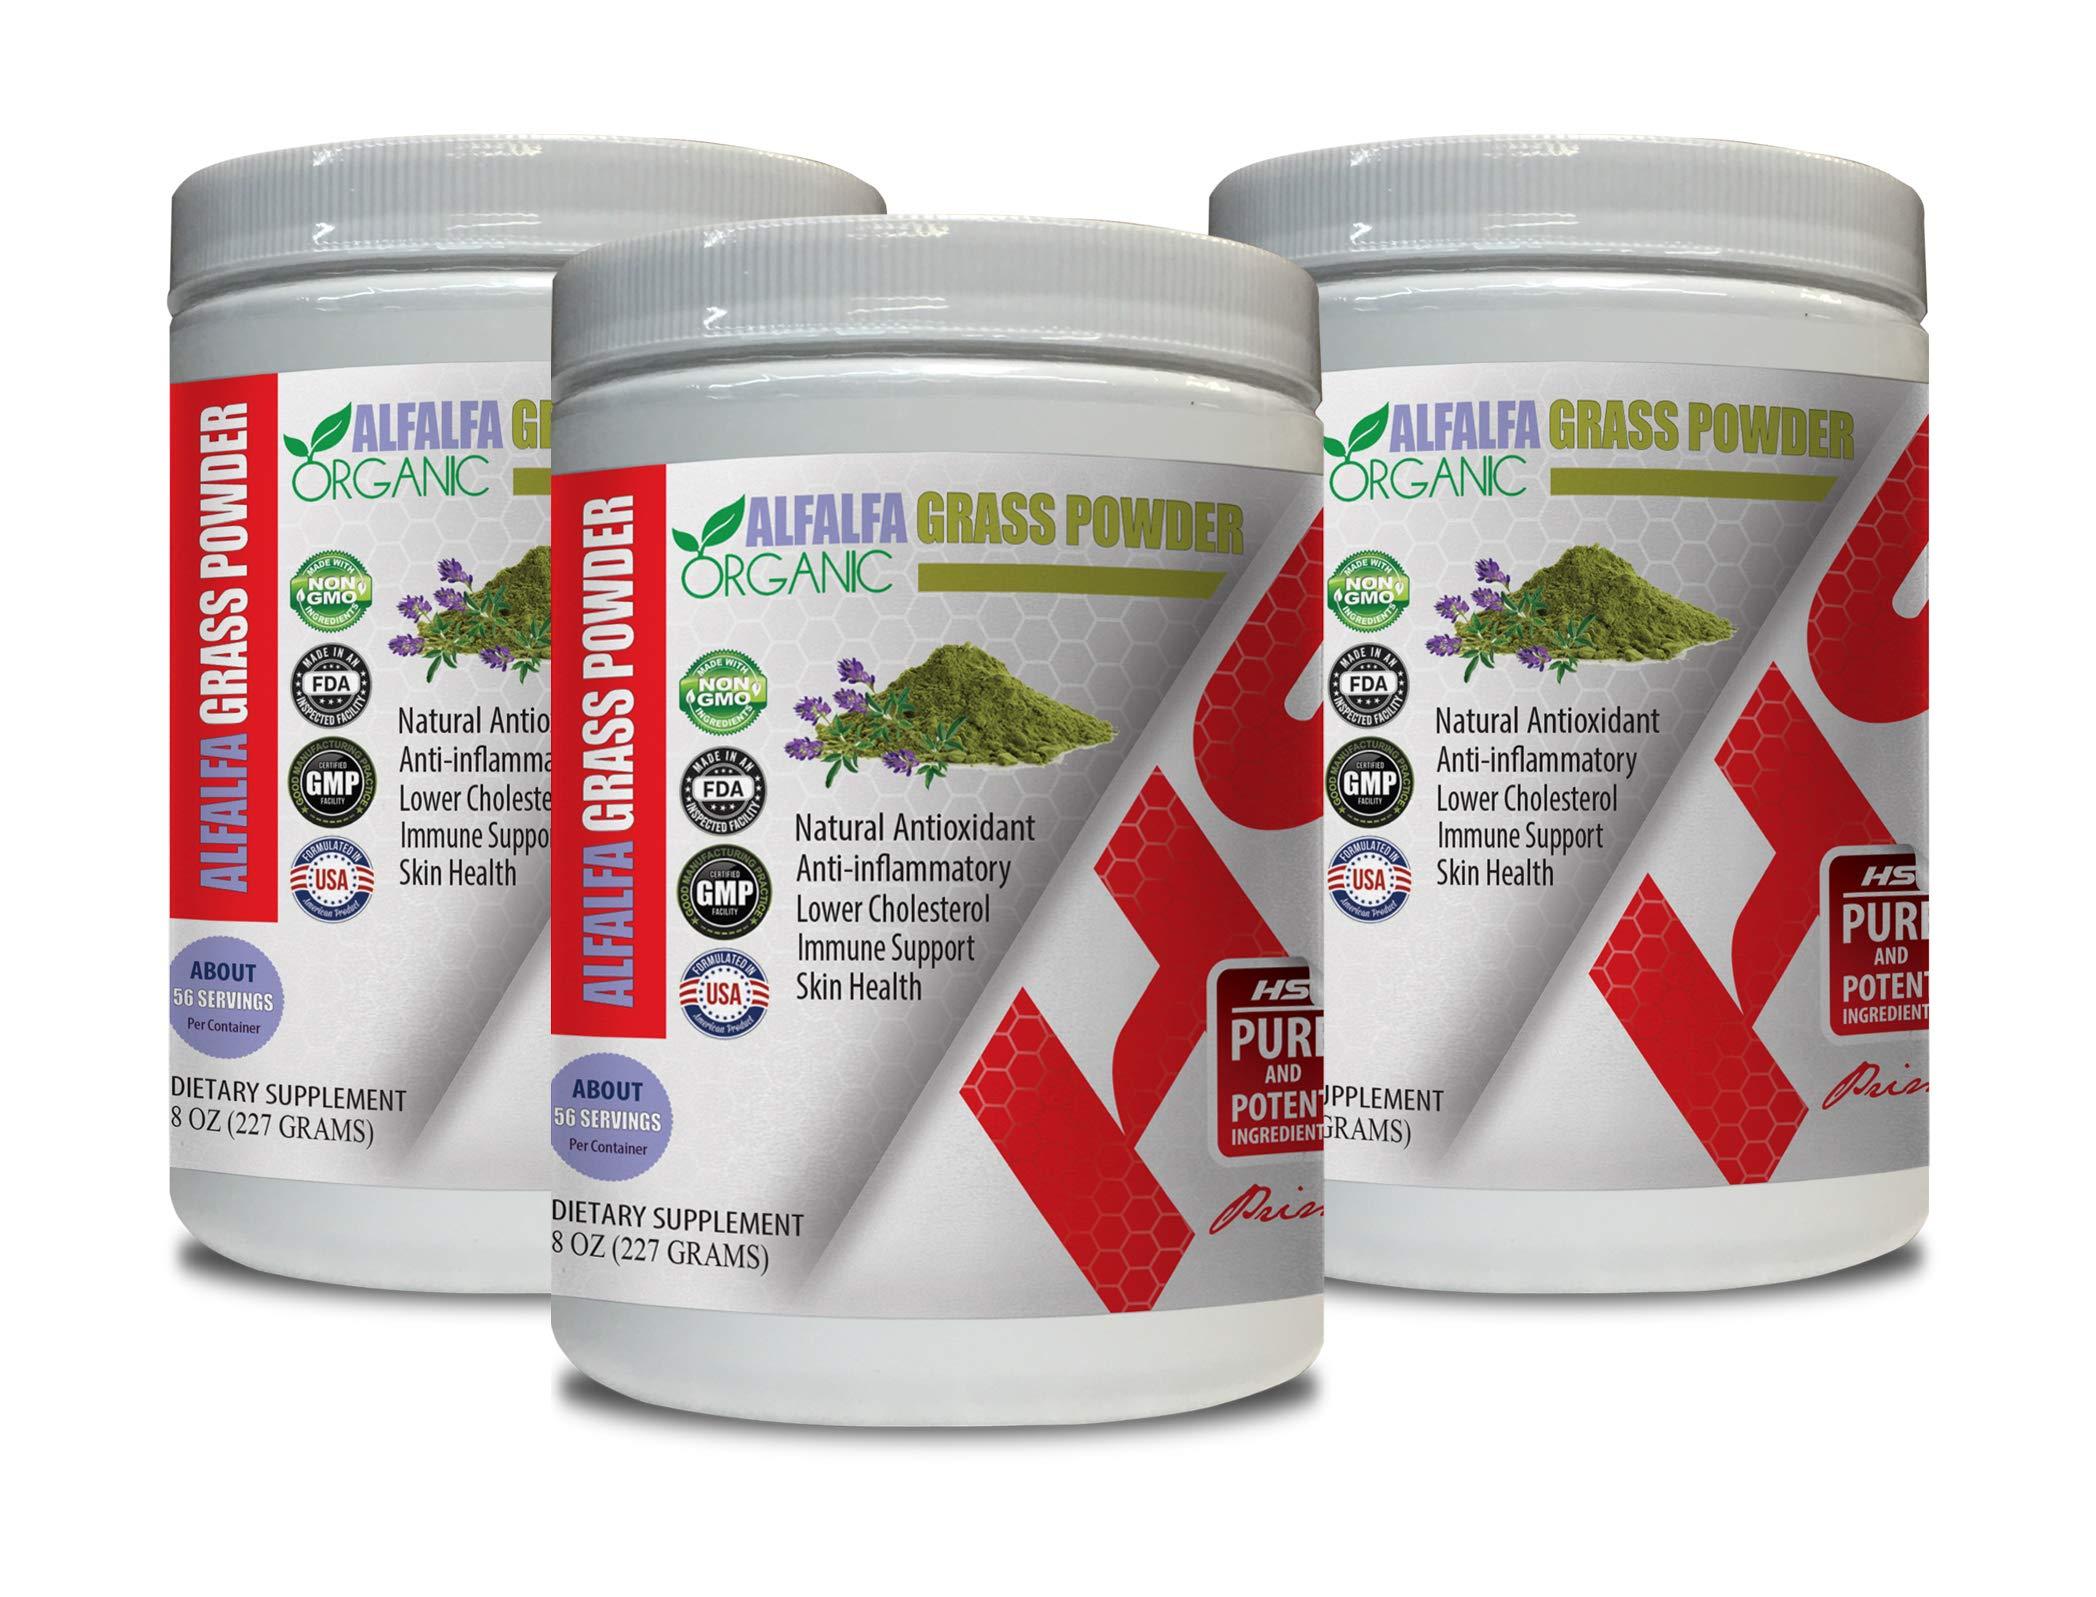 antioxidant Anti Aging - Alfalfa Grass Powder Organic - Digestion aid - 3 Cans 24 OZ (168 Servings)